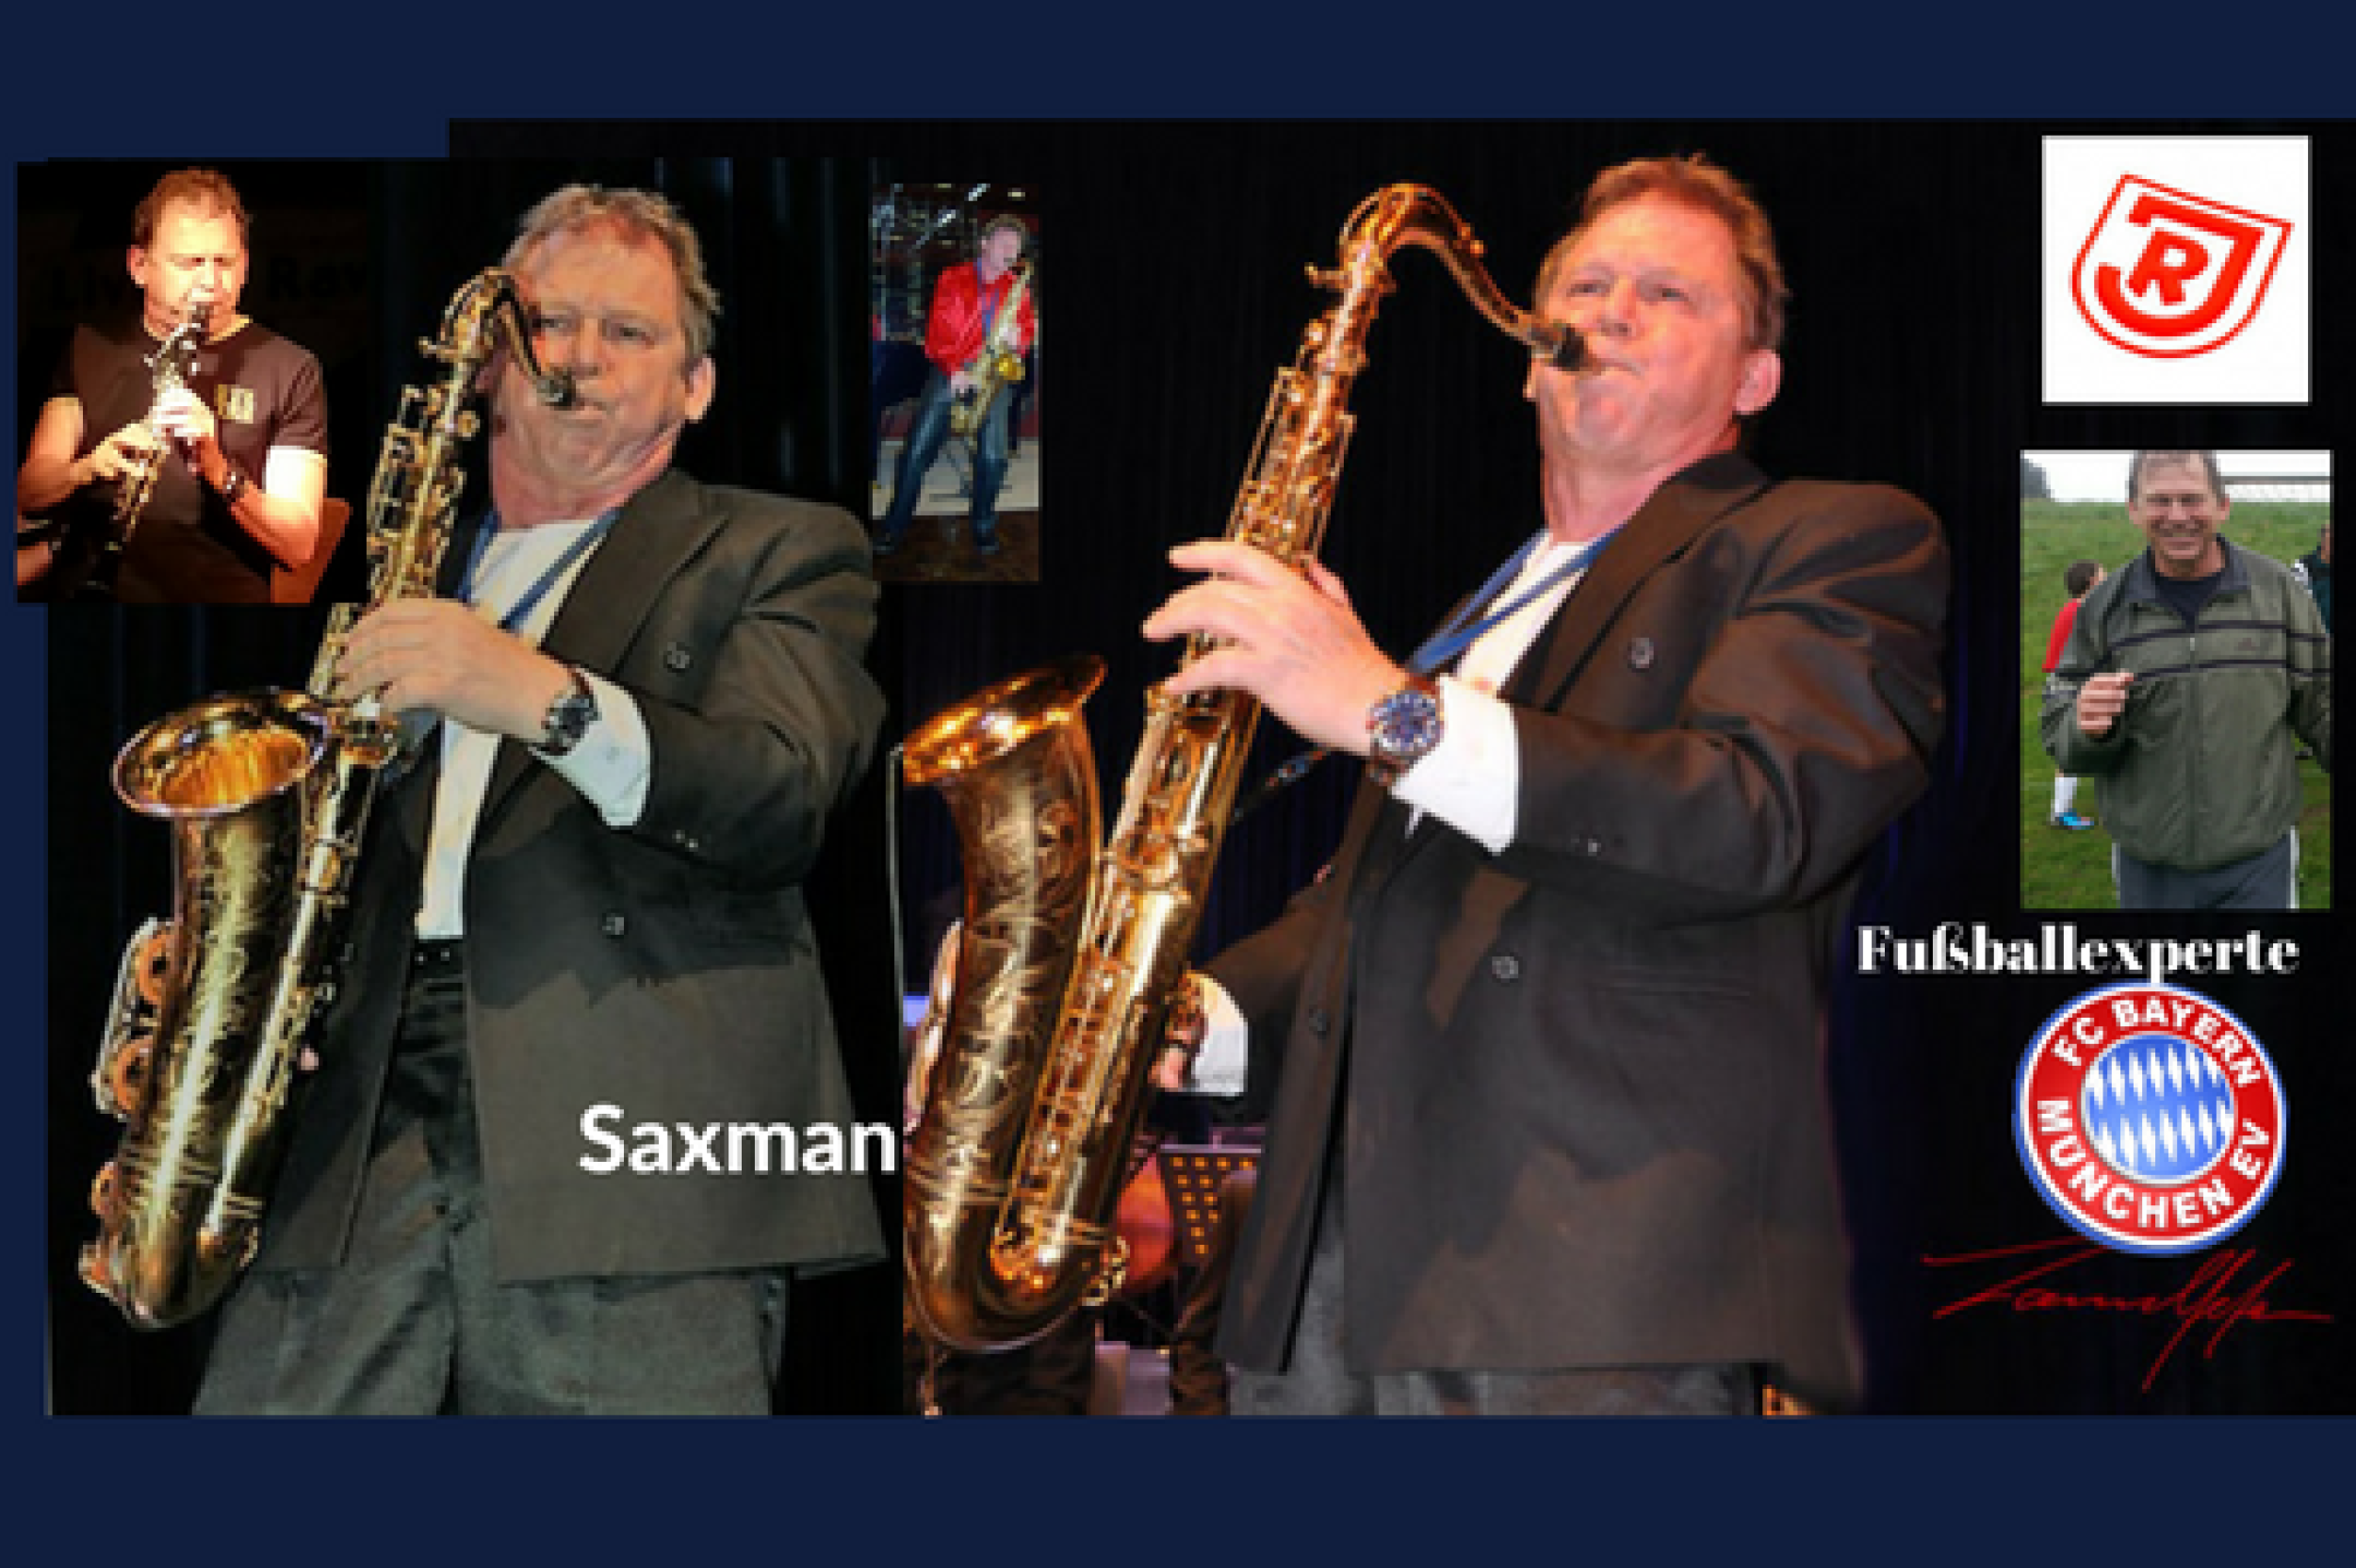 Stefan lamml Big Band Saxophon Solist Saxman und sax Coach